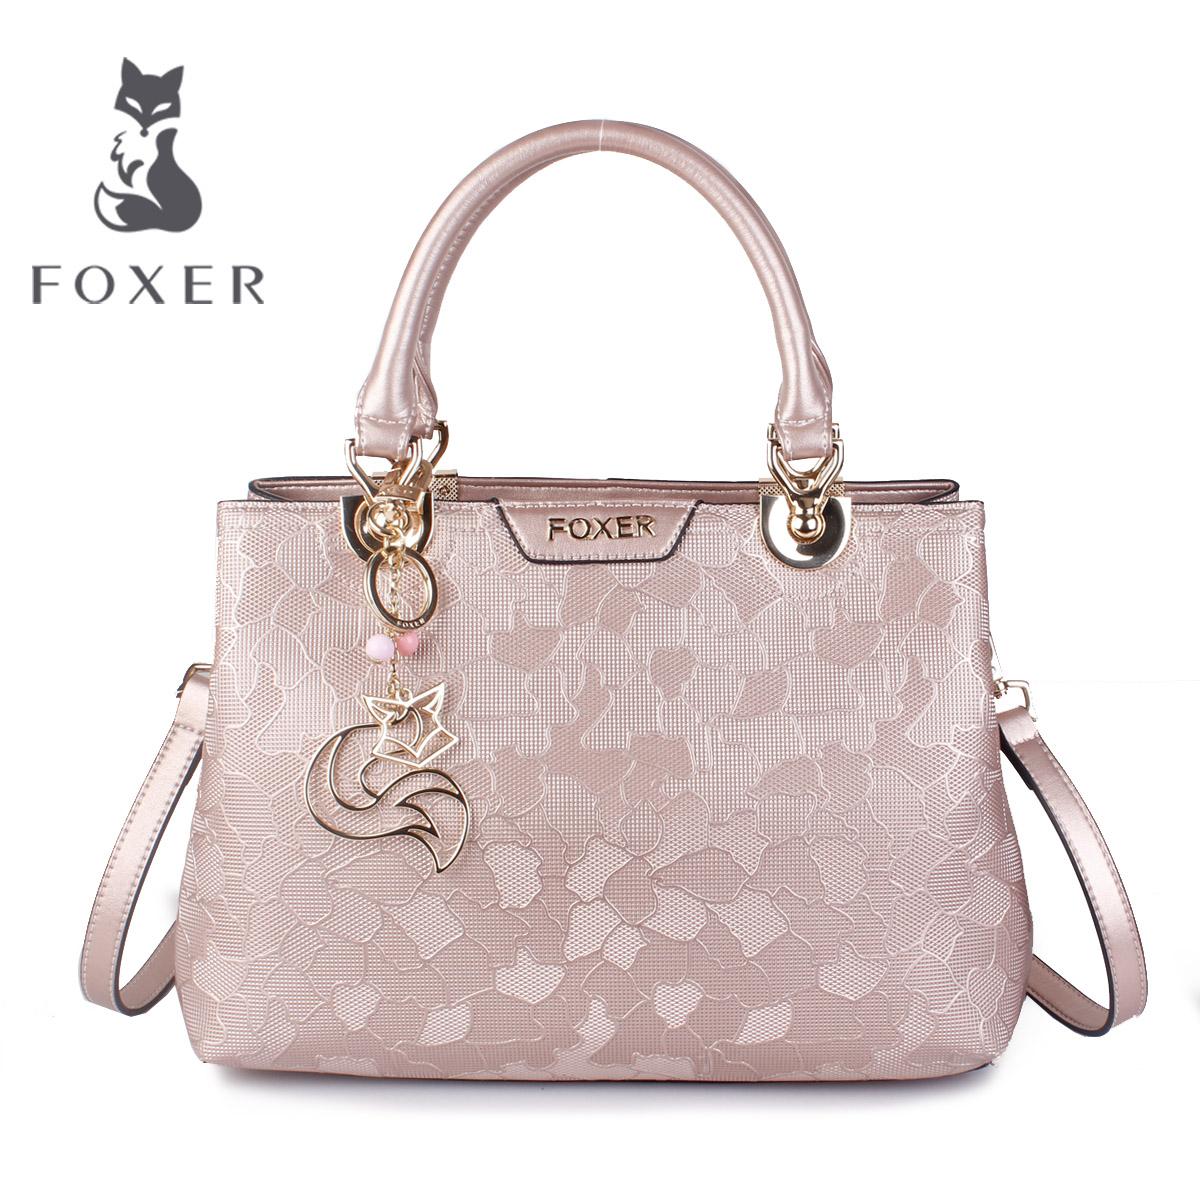 ecc7d545a8 Gold fox leather handbag 2019 new spring and summer handbag ...